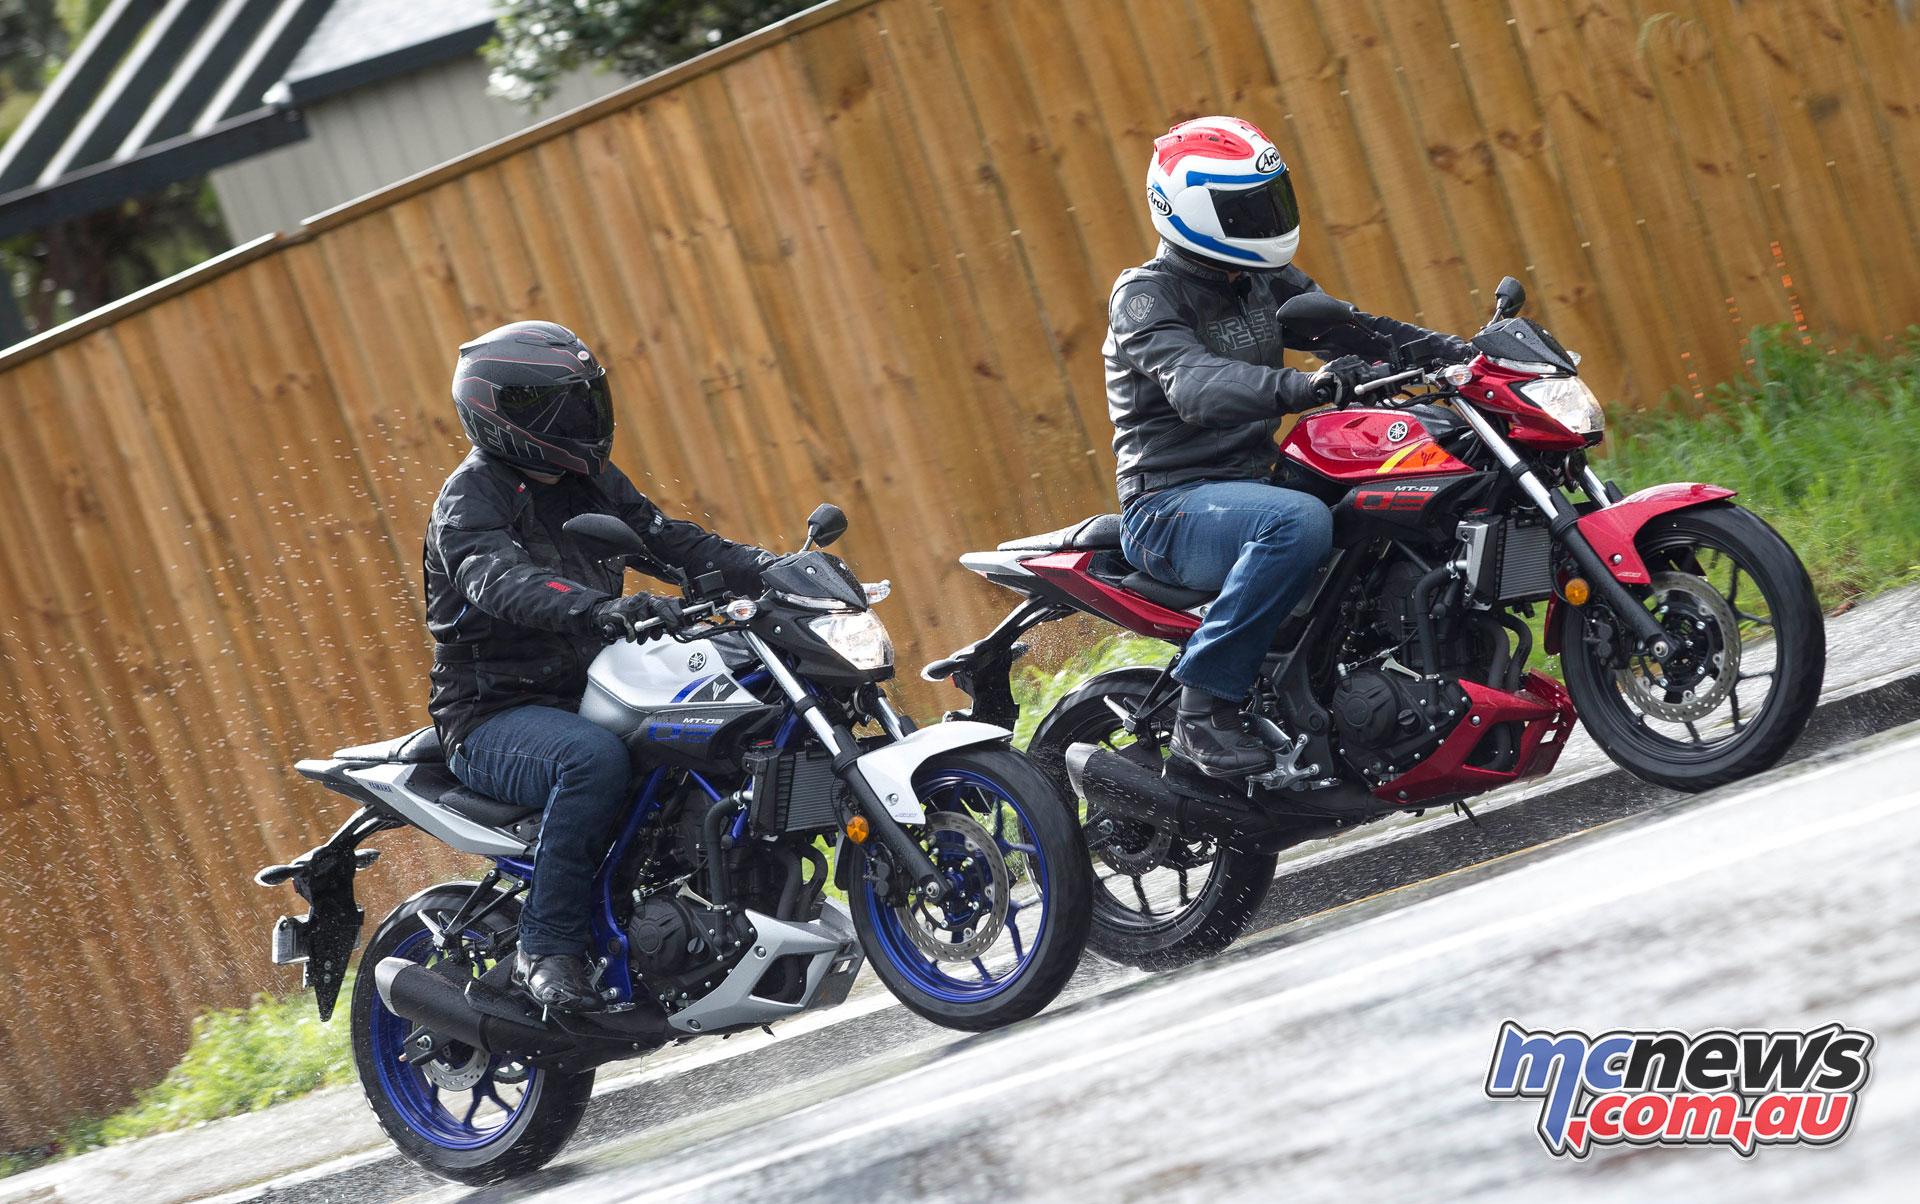 Yamaha Mt 03 Review R3 Based Lams Nakedbike Mcnews Com Au